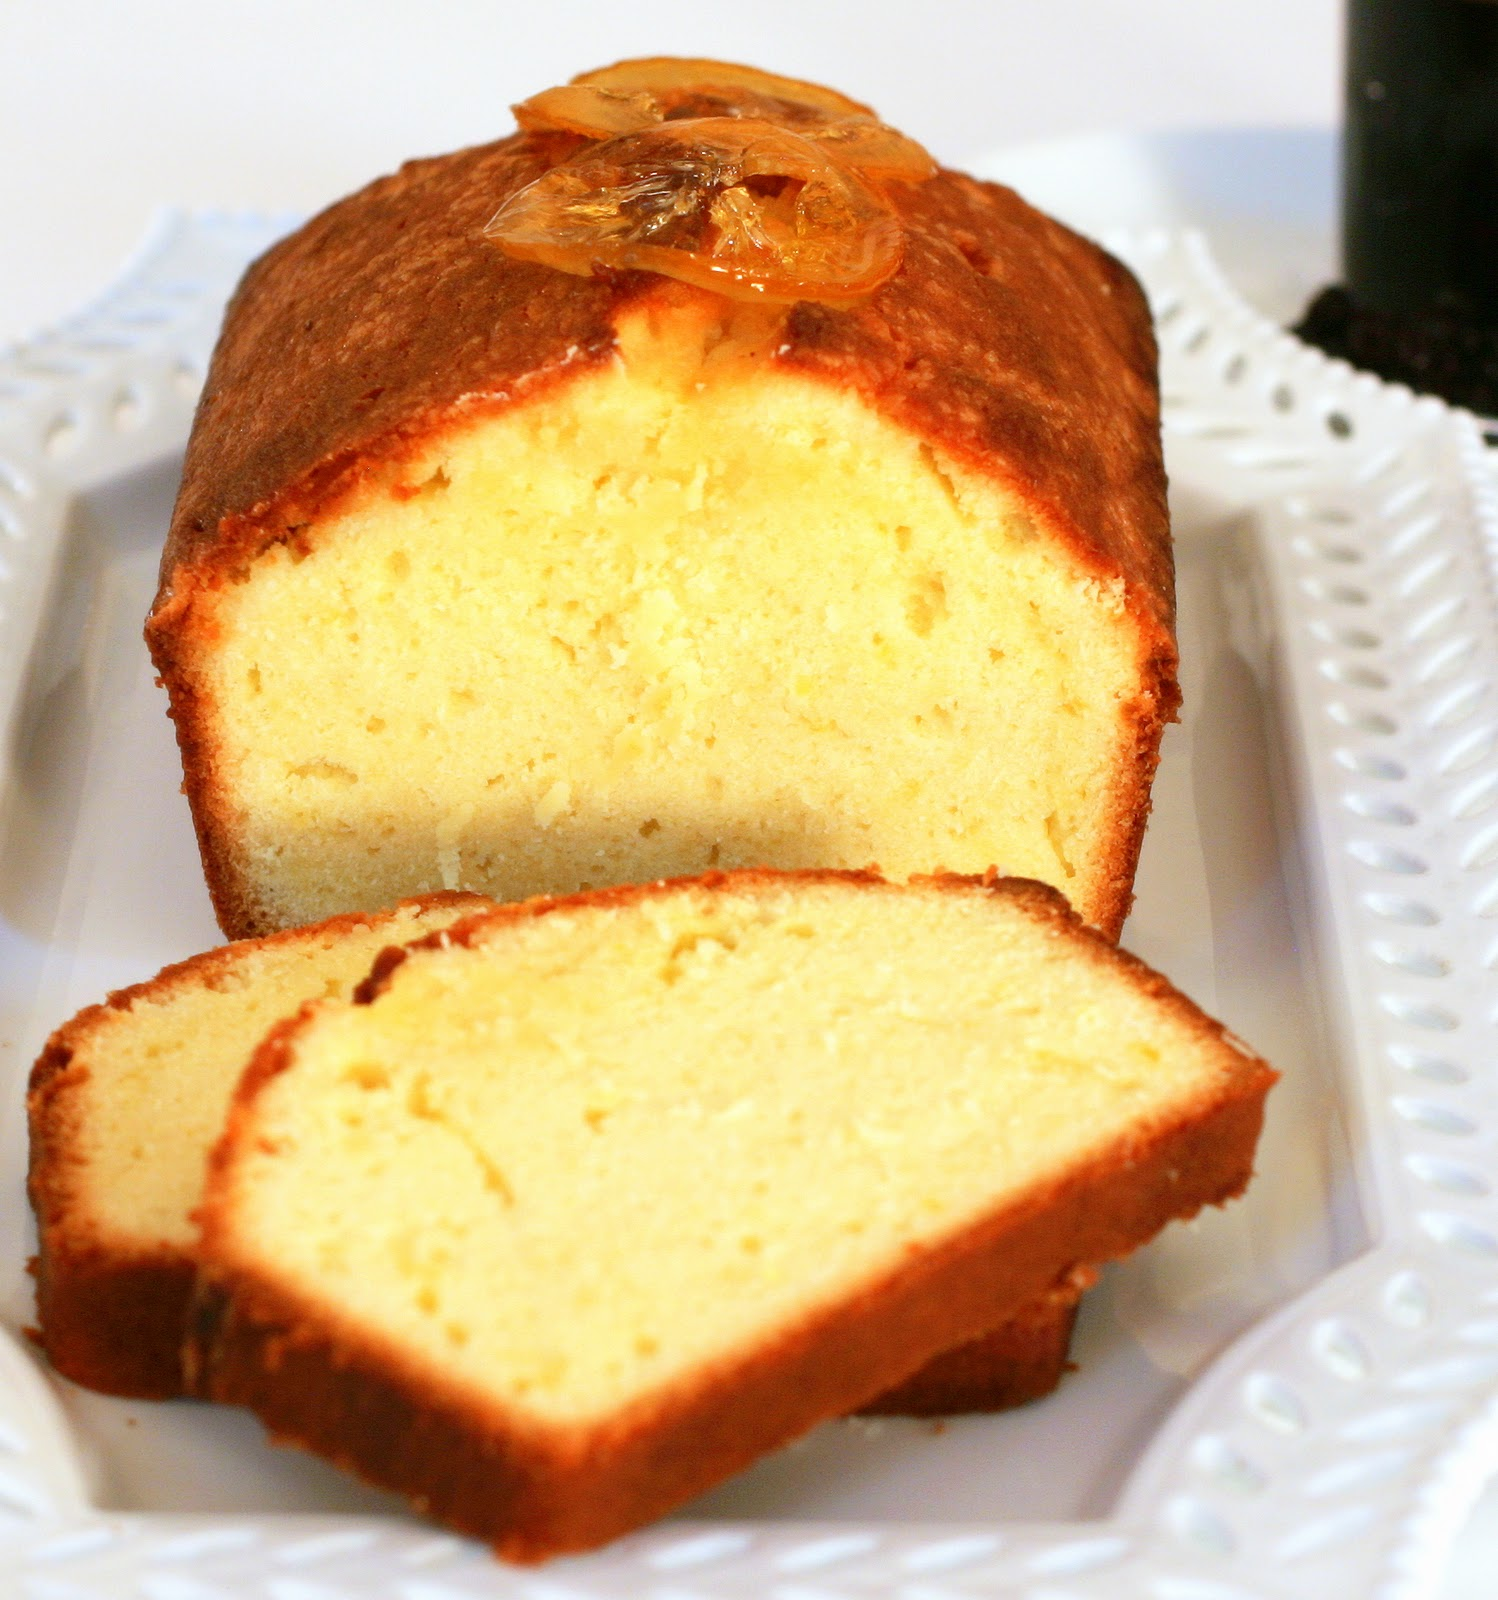 Tish Boyle Sweet Dreams Lemon Pound Cake With Wild